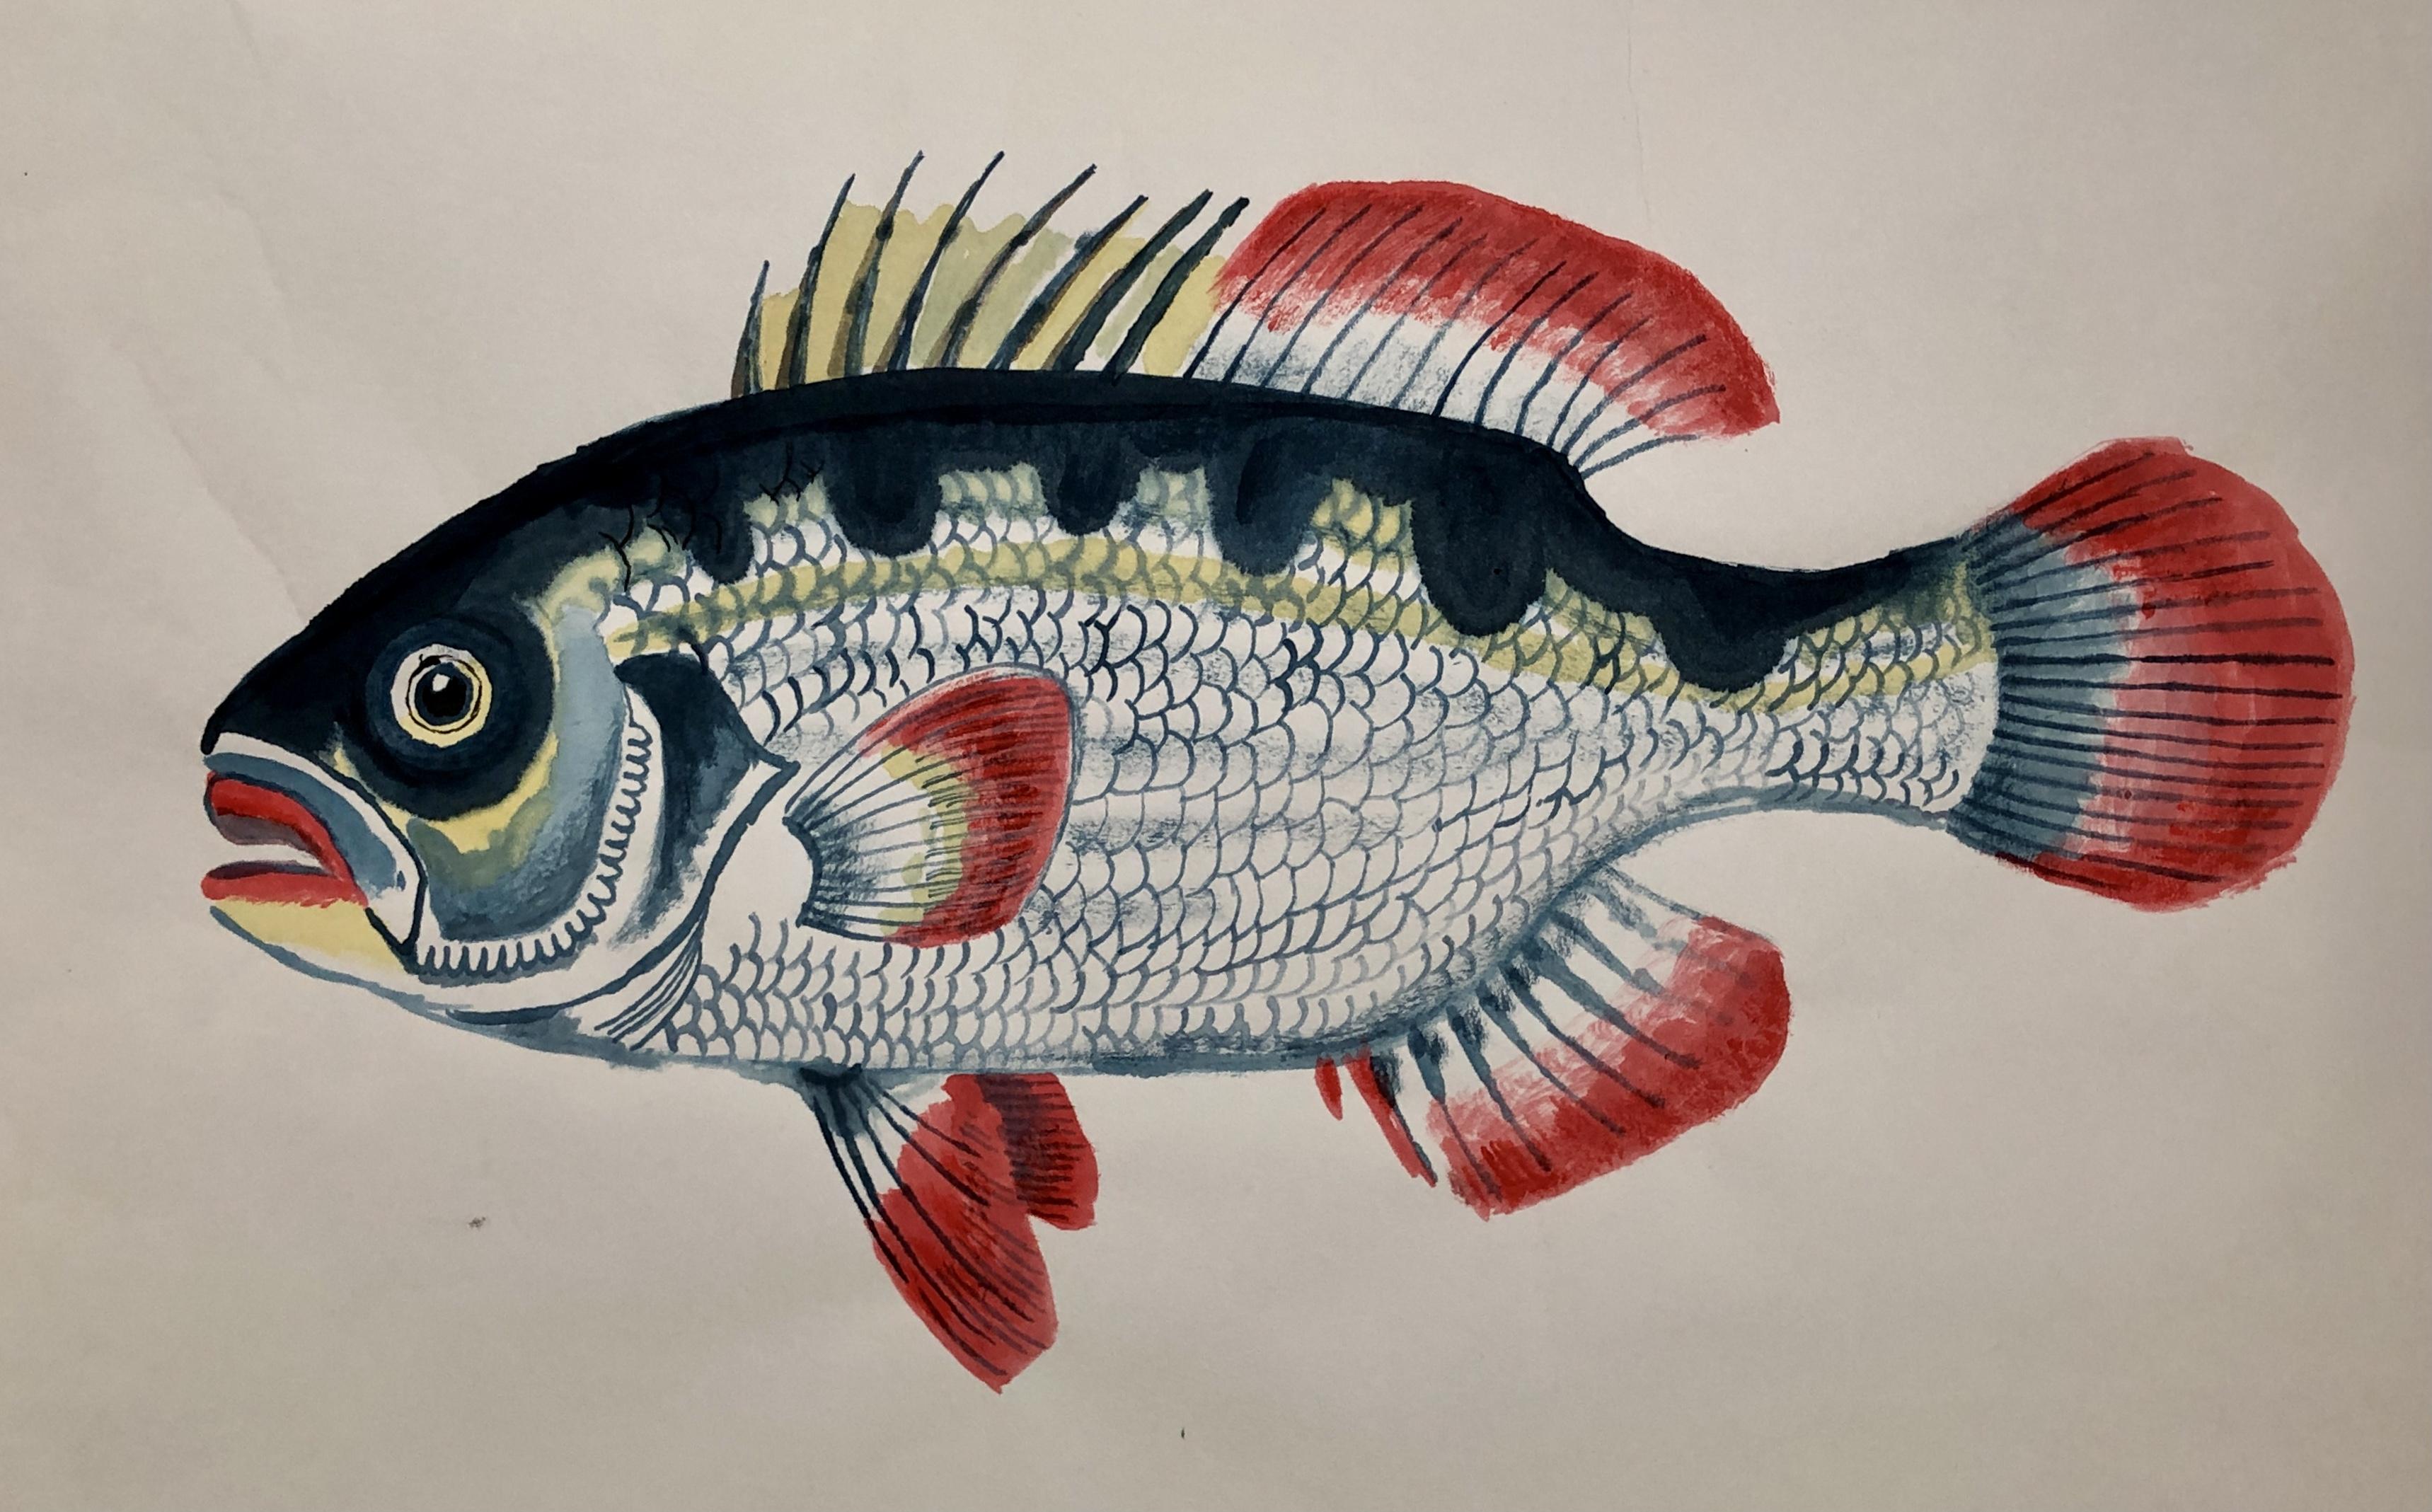 Fish 27, 2020, Tinte, Gouache, Acryl auf Japanpapier, 35 x 45 cm